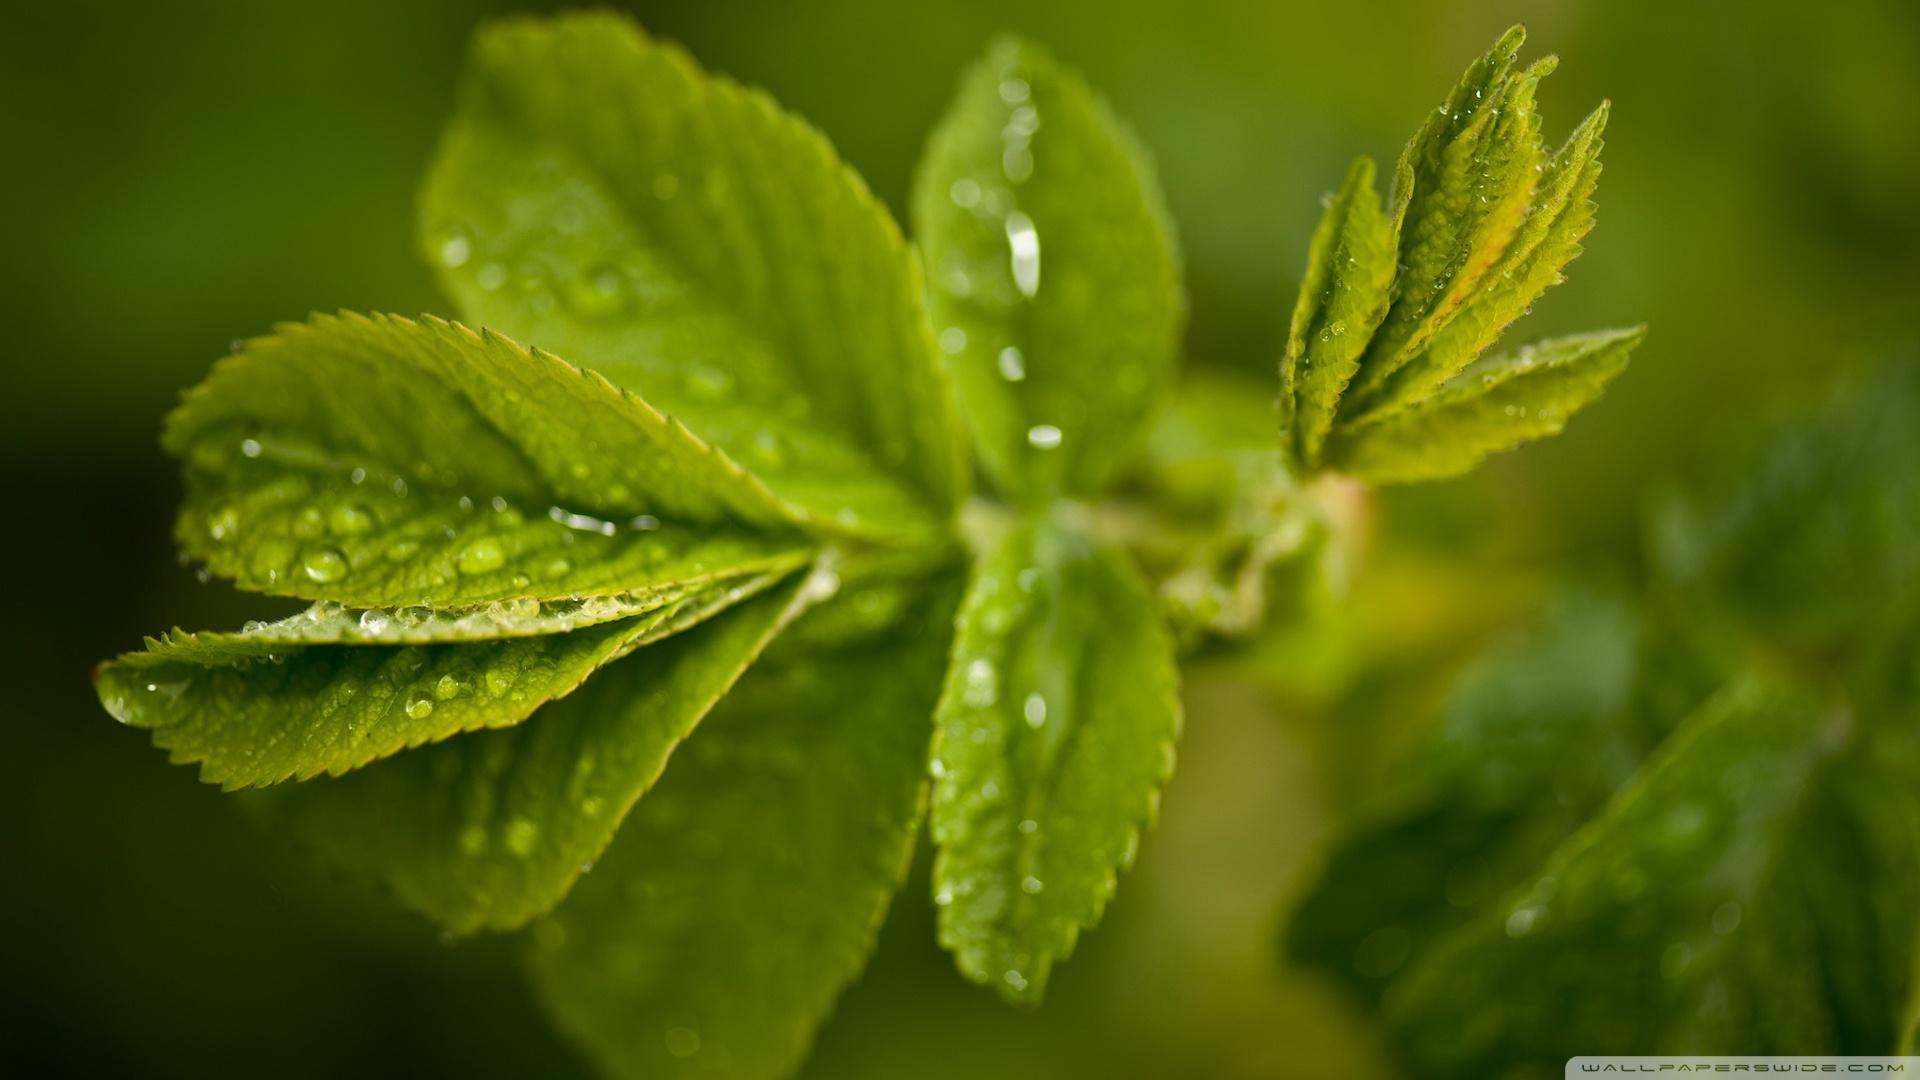 Ganesh 3d Name Wallpaper Fresh Green Leaves And Water Drops 4k Hd Desktop Wallpaper